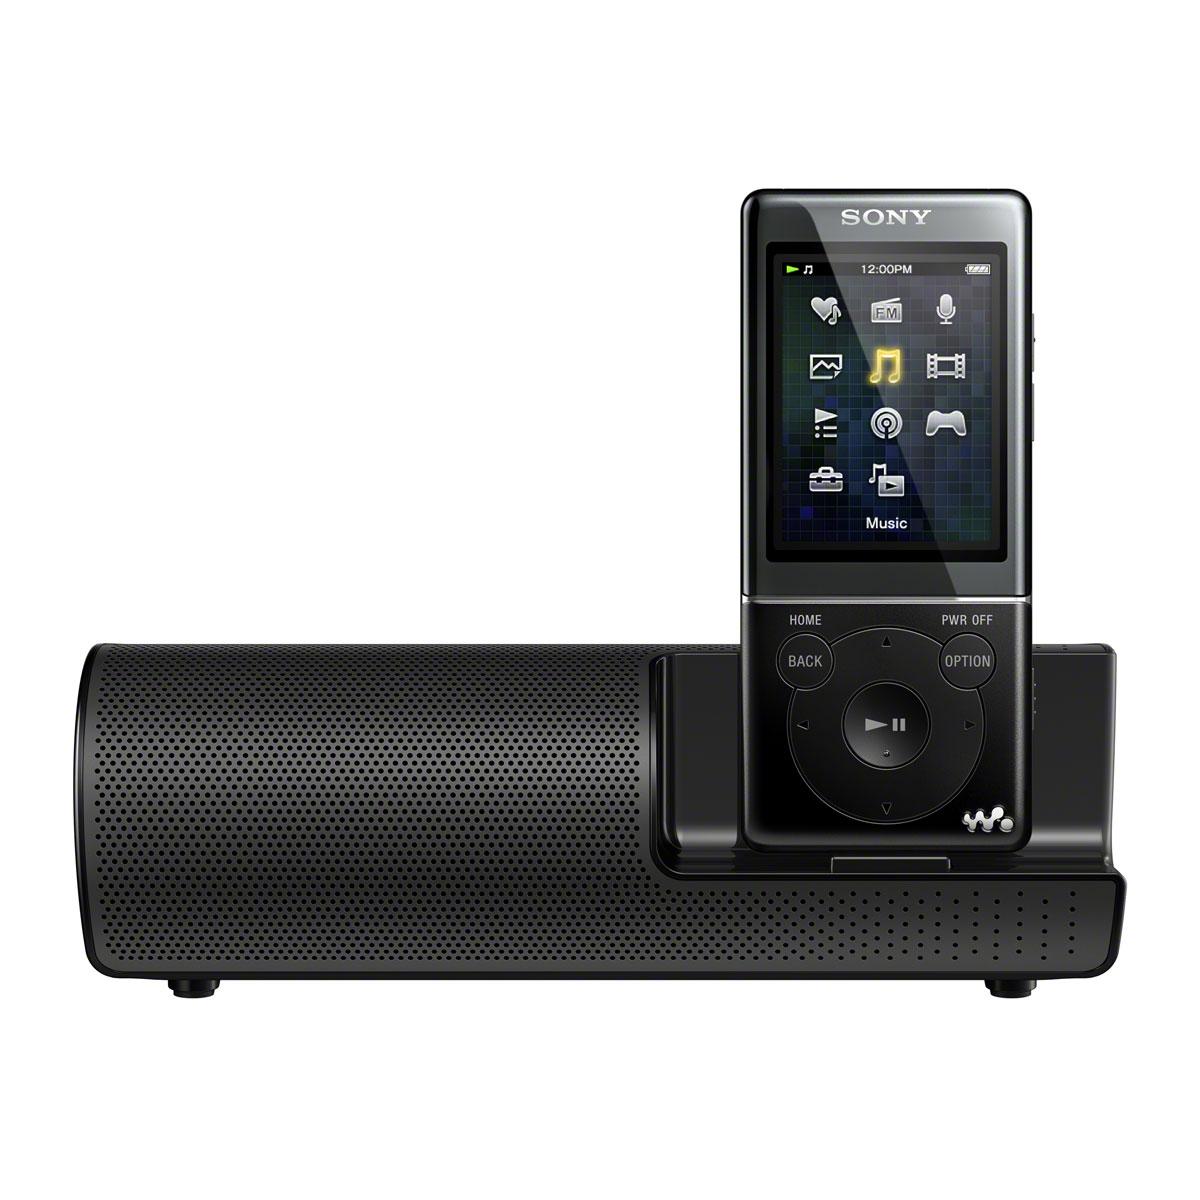 sony nwz e473k lecteur mp3 ipod sony sur ldlc. Black Bedroom Furniture Sets. Home Design Ideas